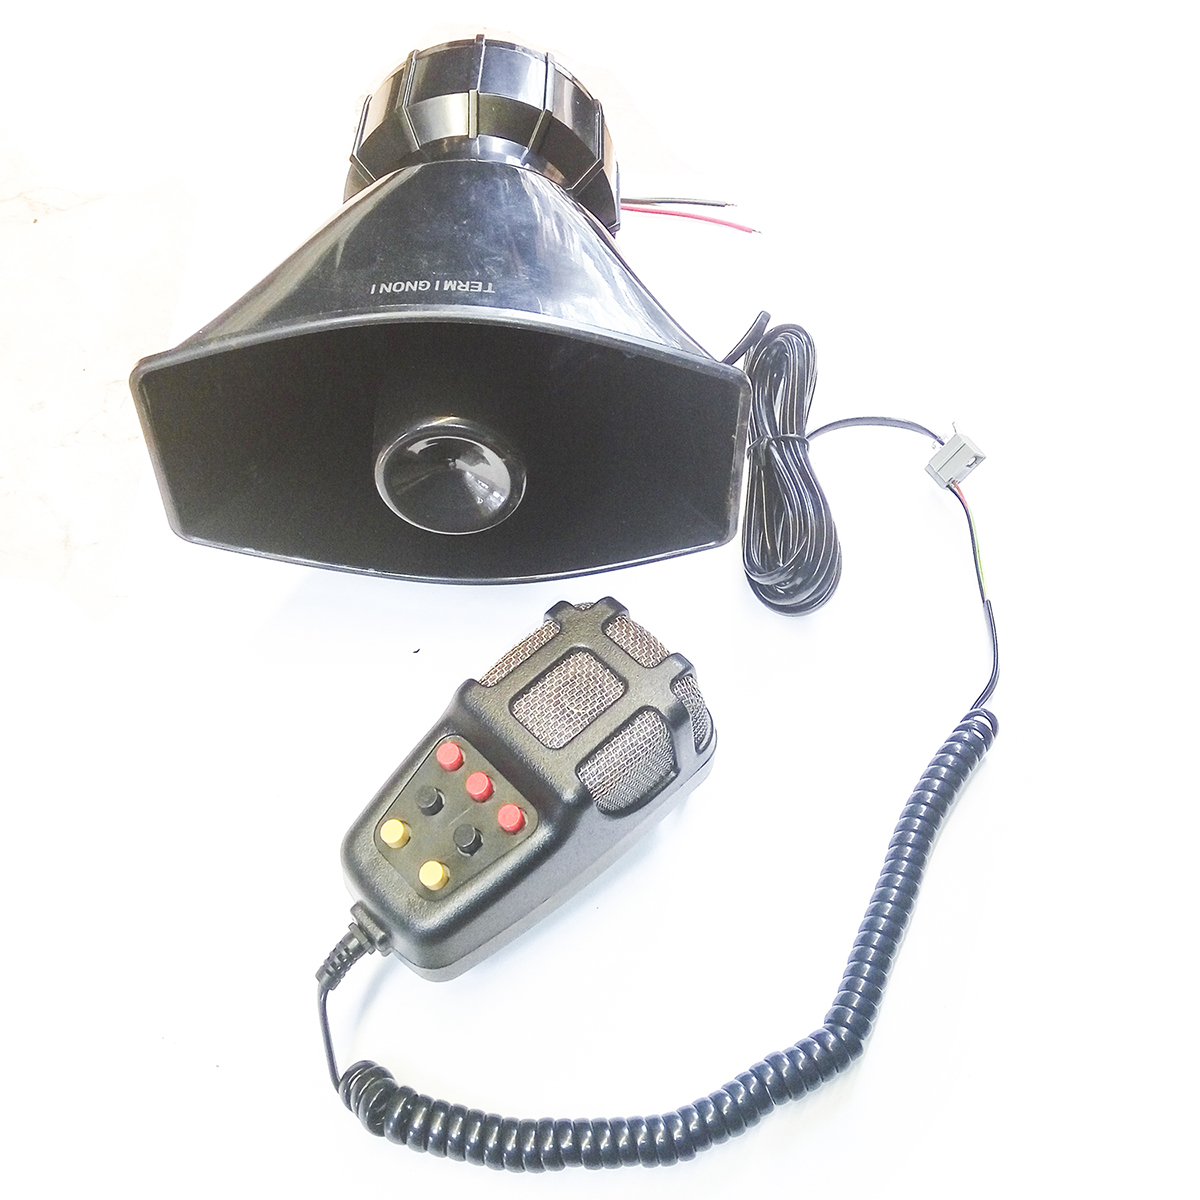 Buy Sell Cheapest Toa 7 Suara Best Quality Product Deals Alarm Sirine 6 Termignoni Klakson 12v Microphone Ukuran Super Big Besar